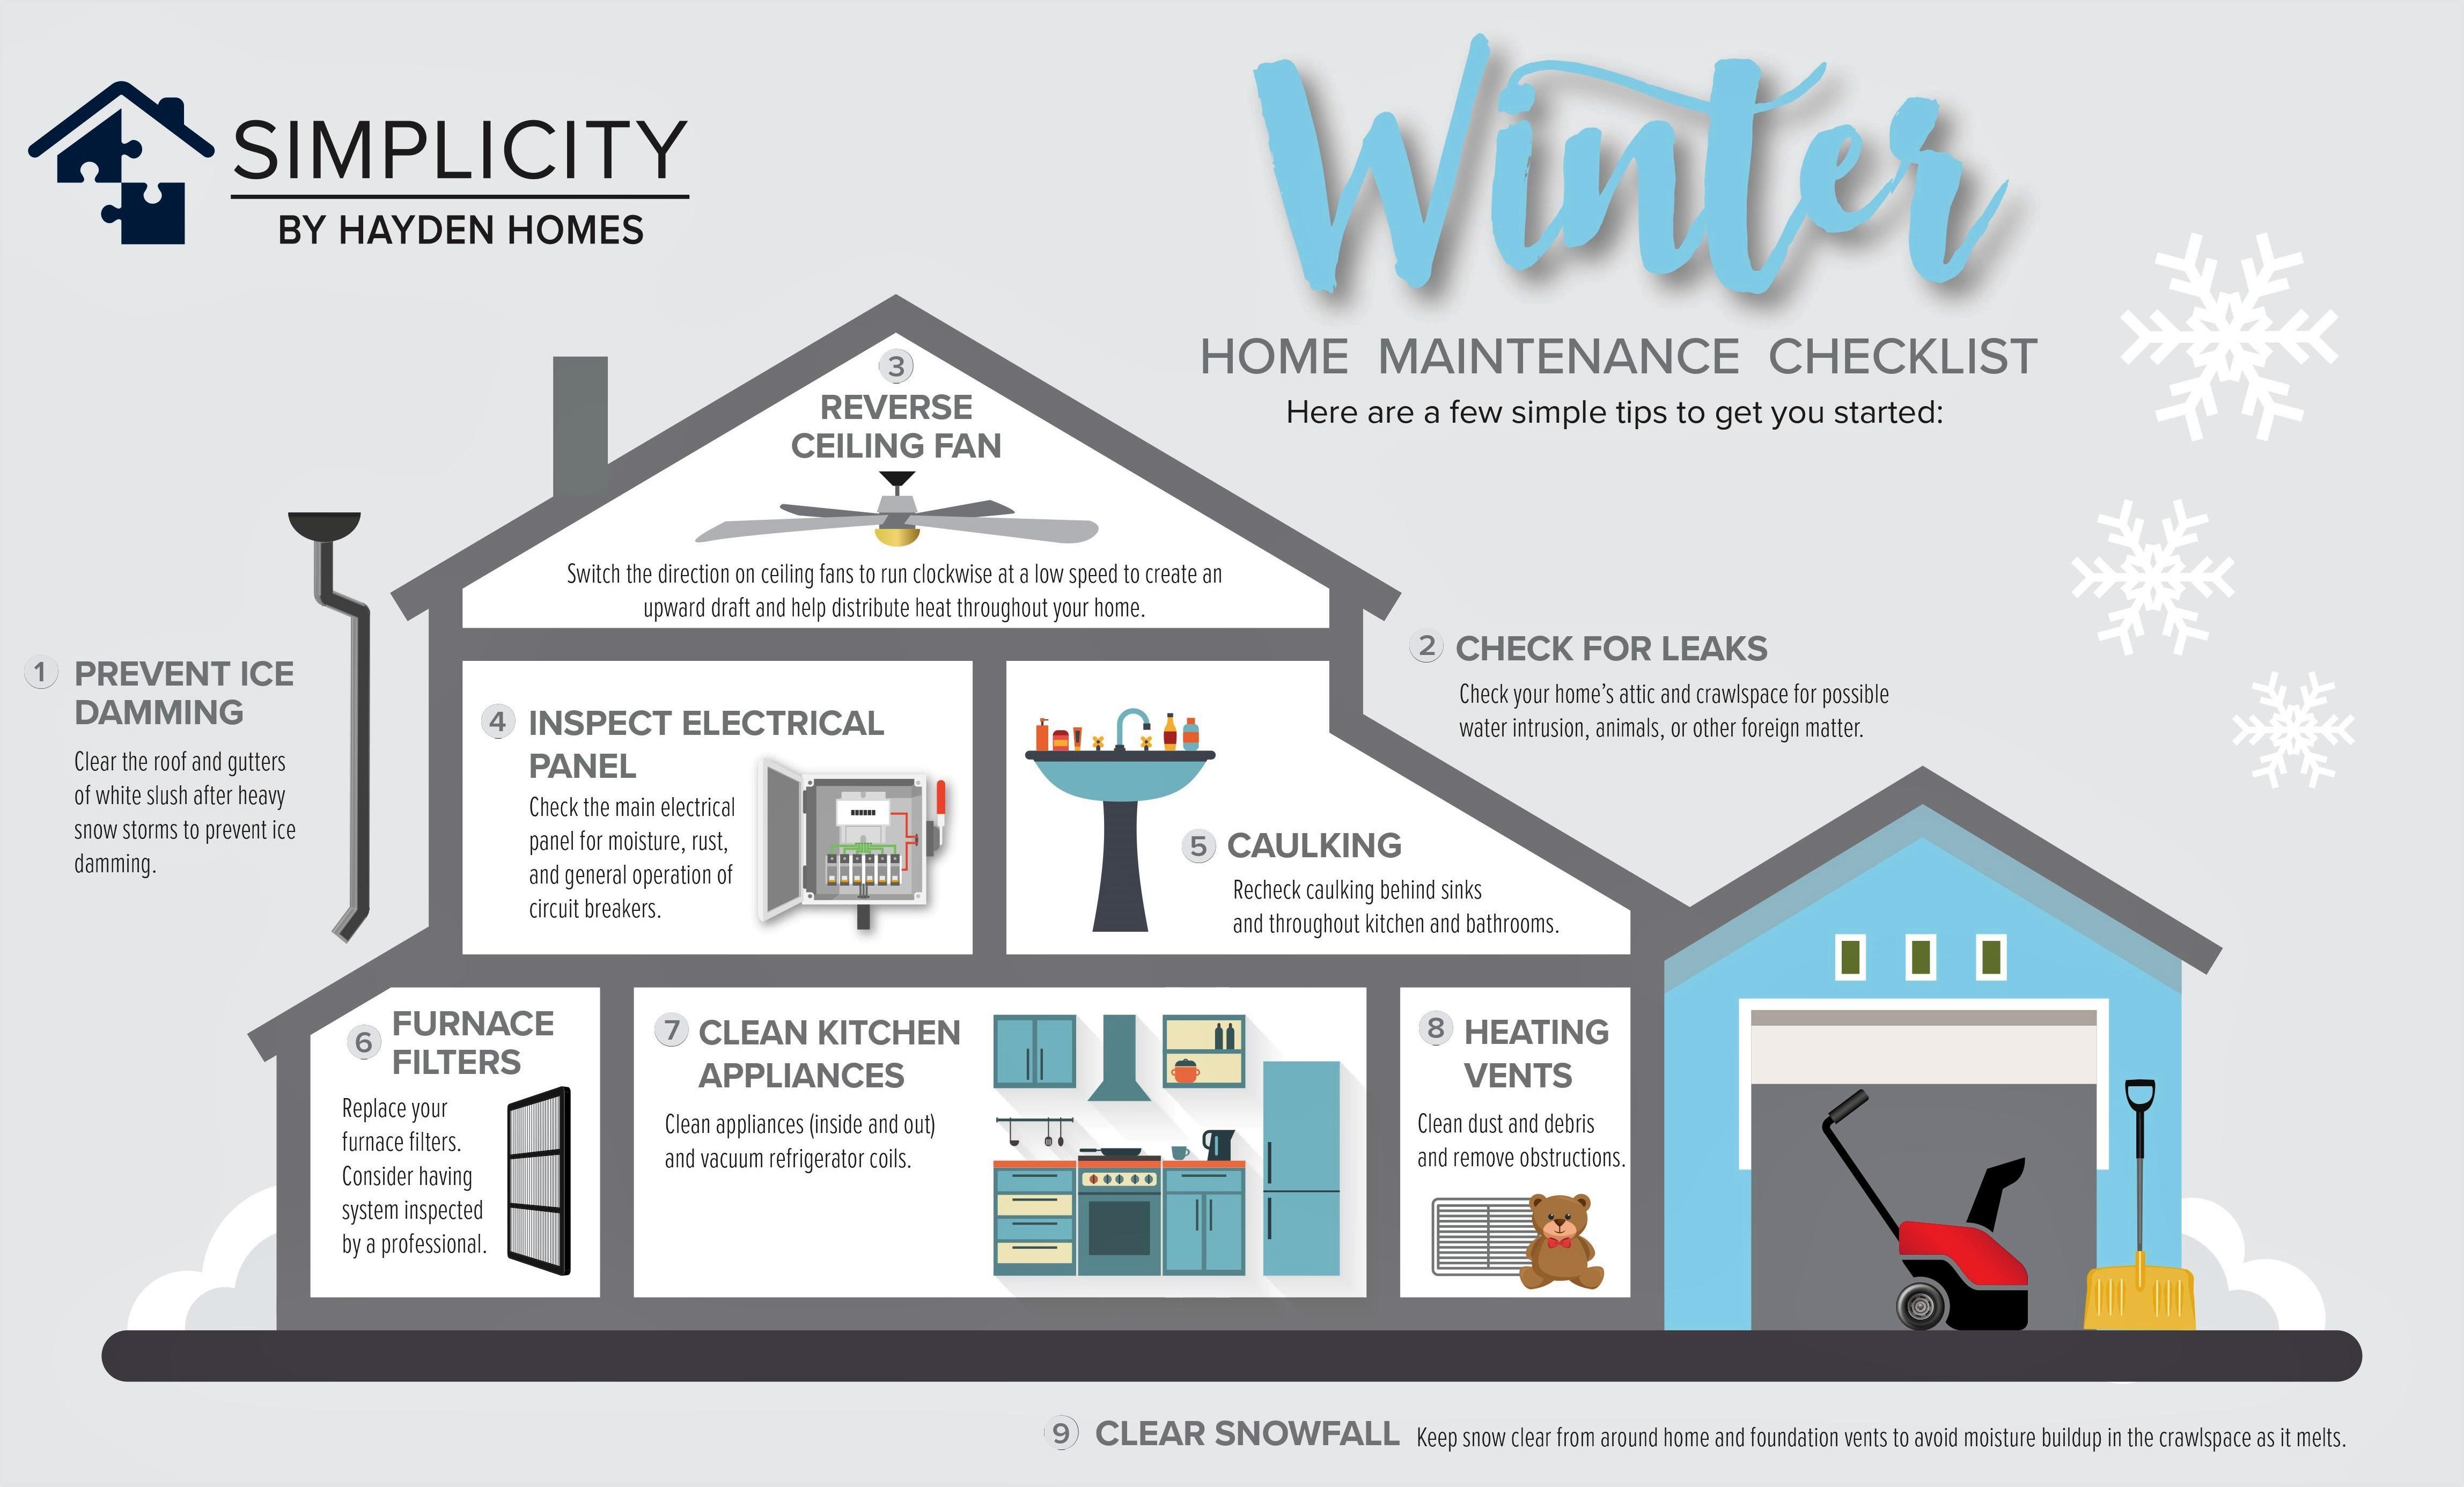 Winter home maintenance checklist infographic